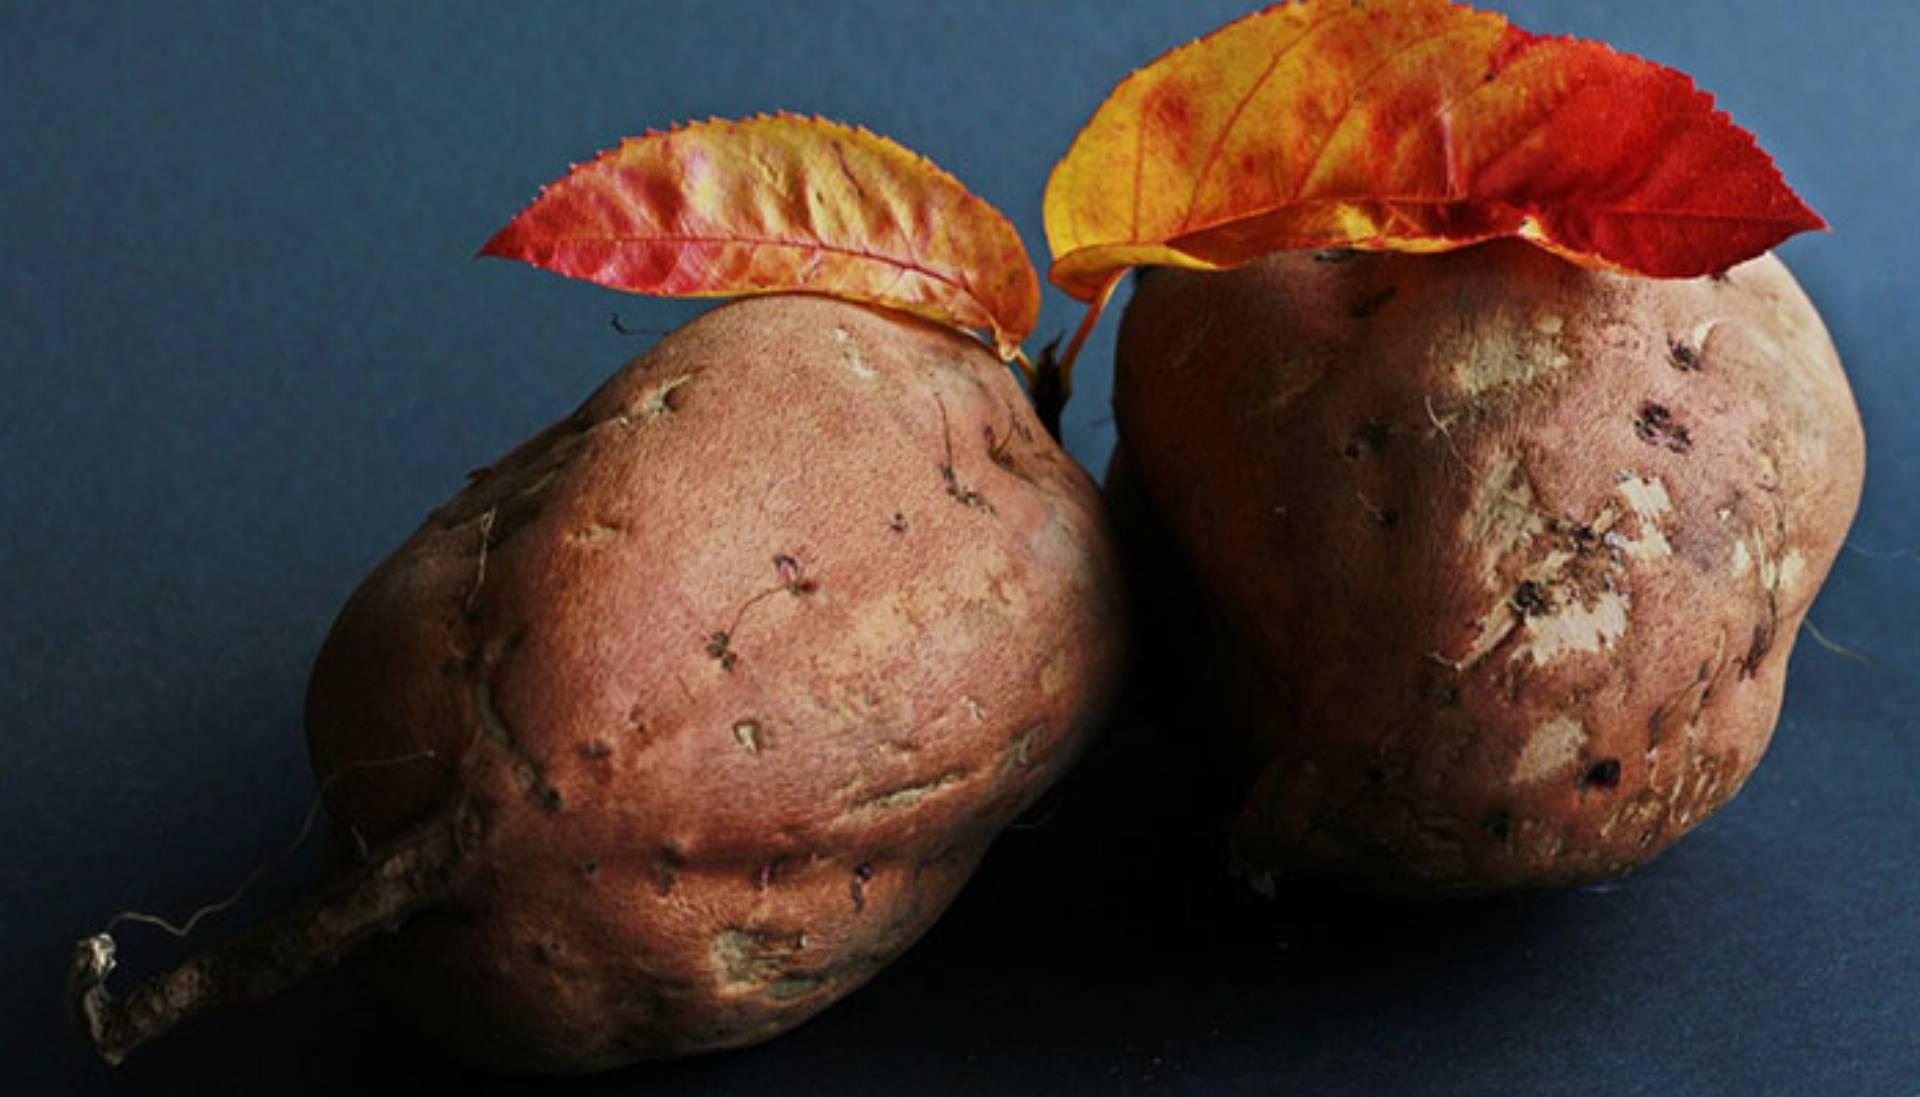 sweet-potato-534874_960_720